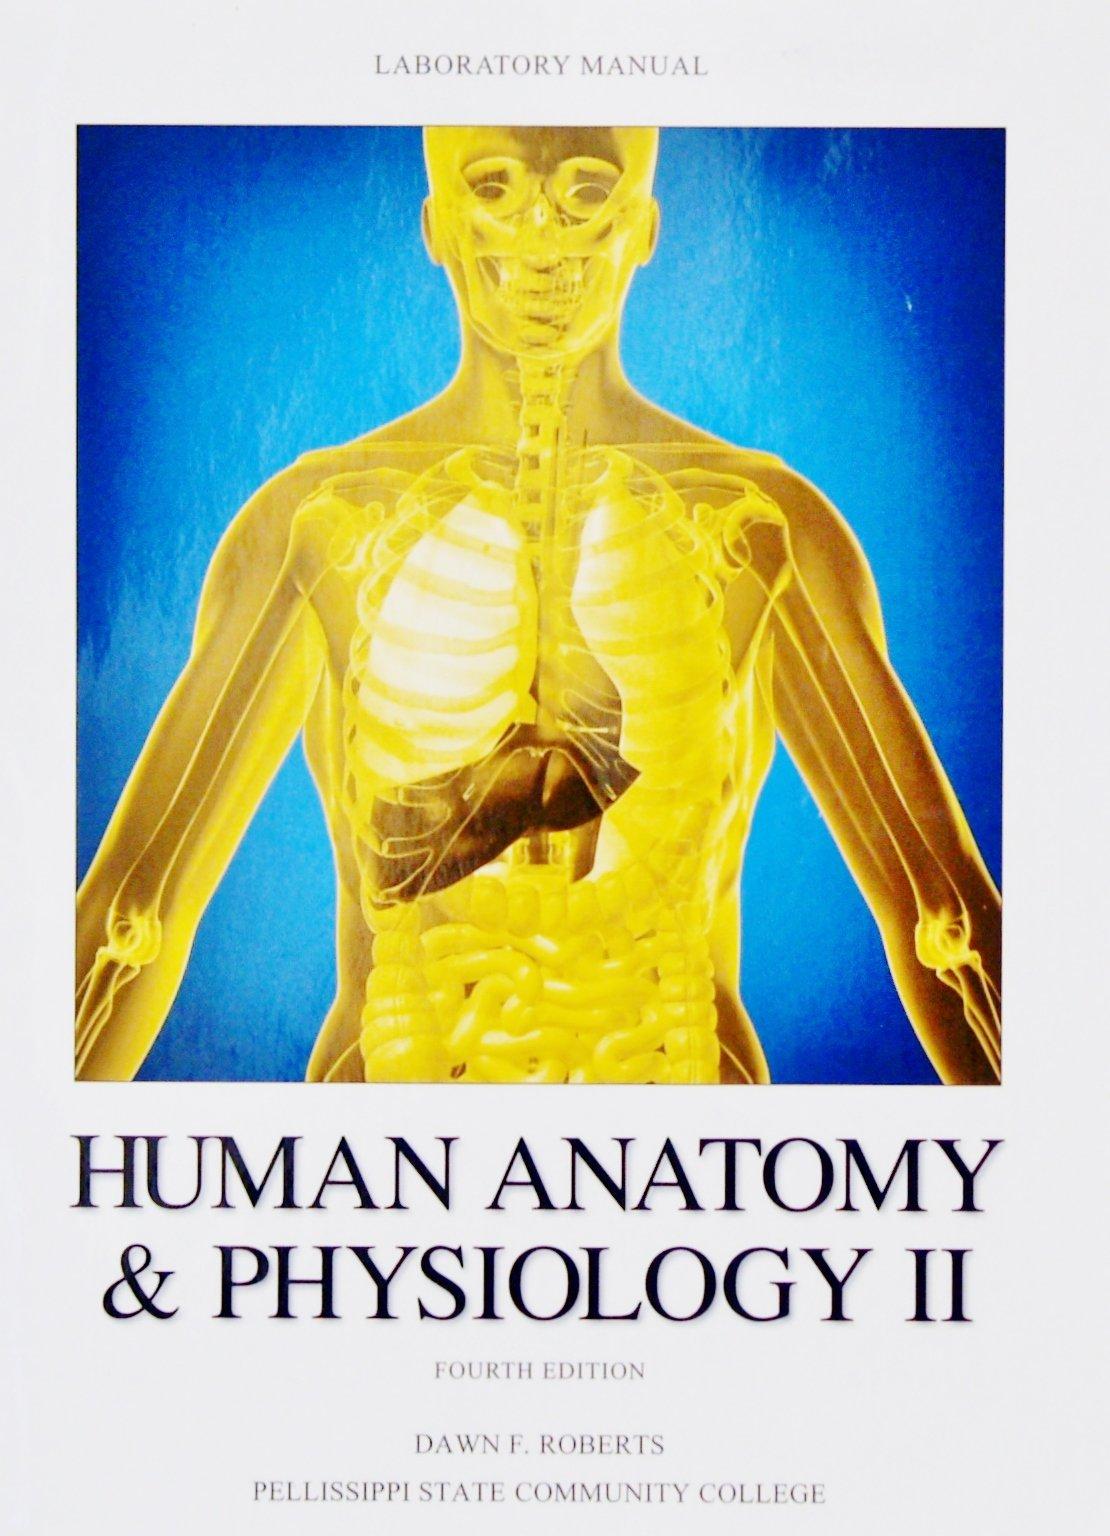 Human Anatomy & Physiology II Fourth Edition Laboratory Manual Pellissippi  State Community College: Dawn F. Roberts: 9781599846439: Amazon.com: Books